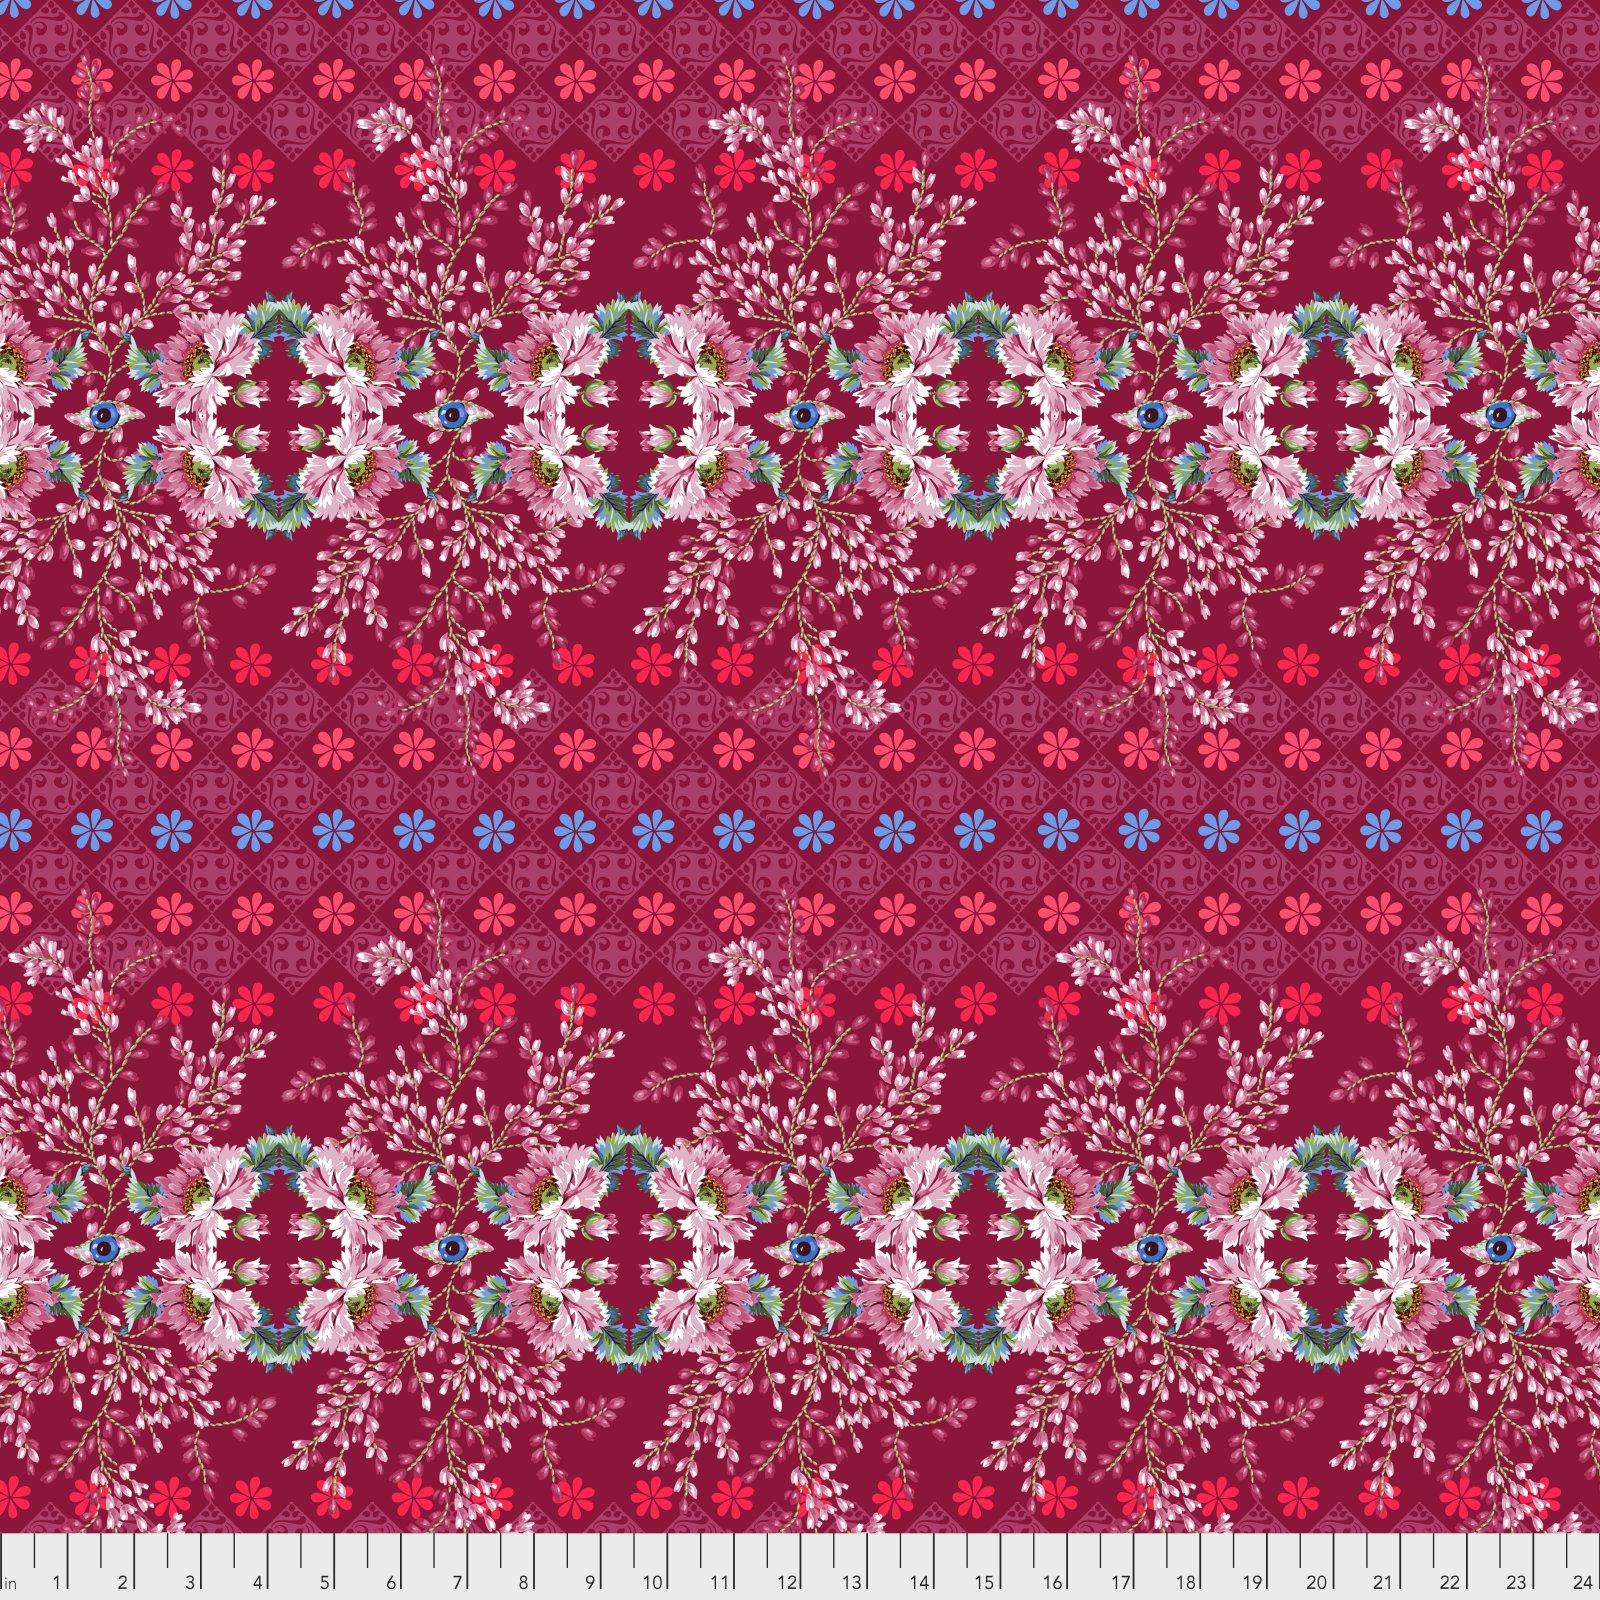 Jardin de la Reine by Odile Bailloeul for Free Spirit Fabrics - The Queen's Spy - Rose